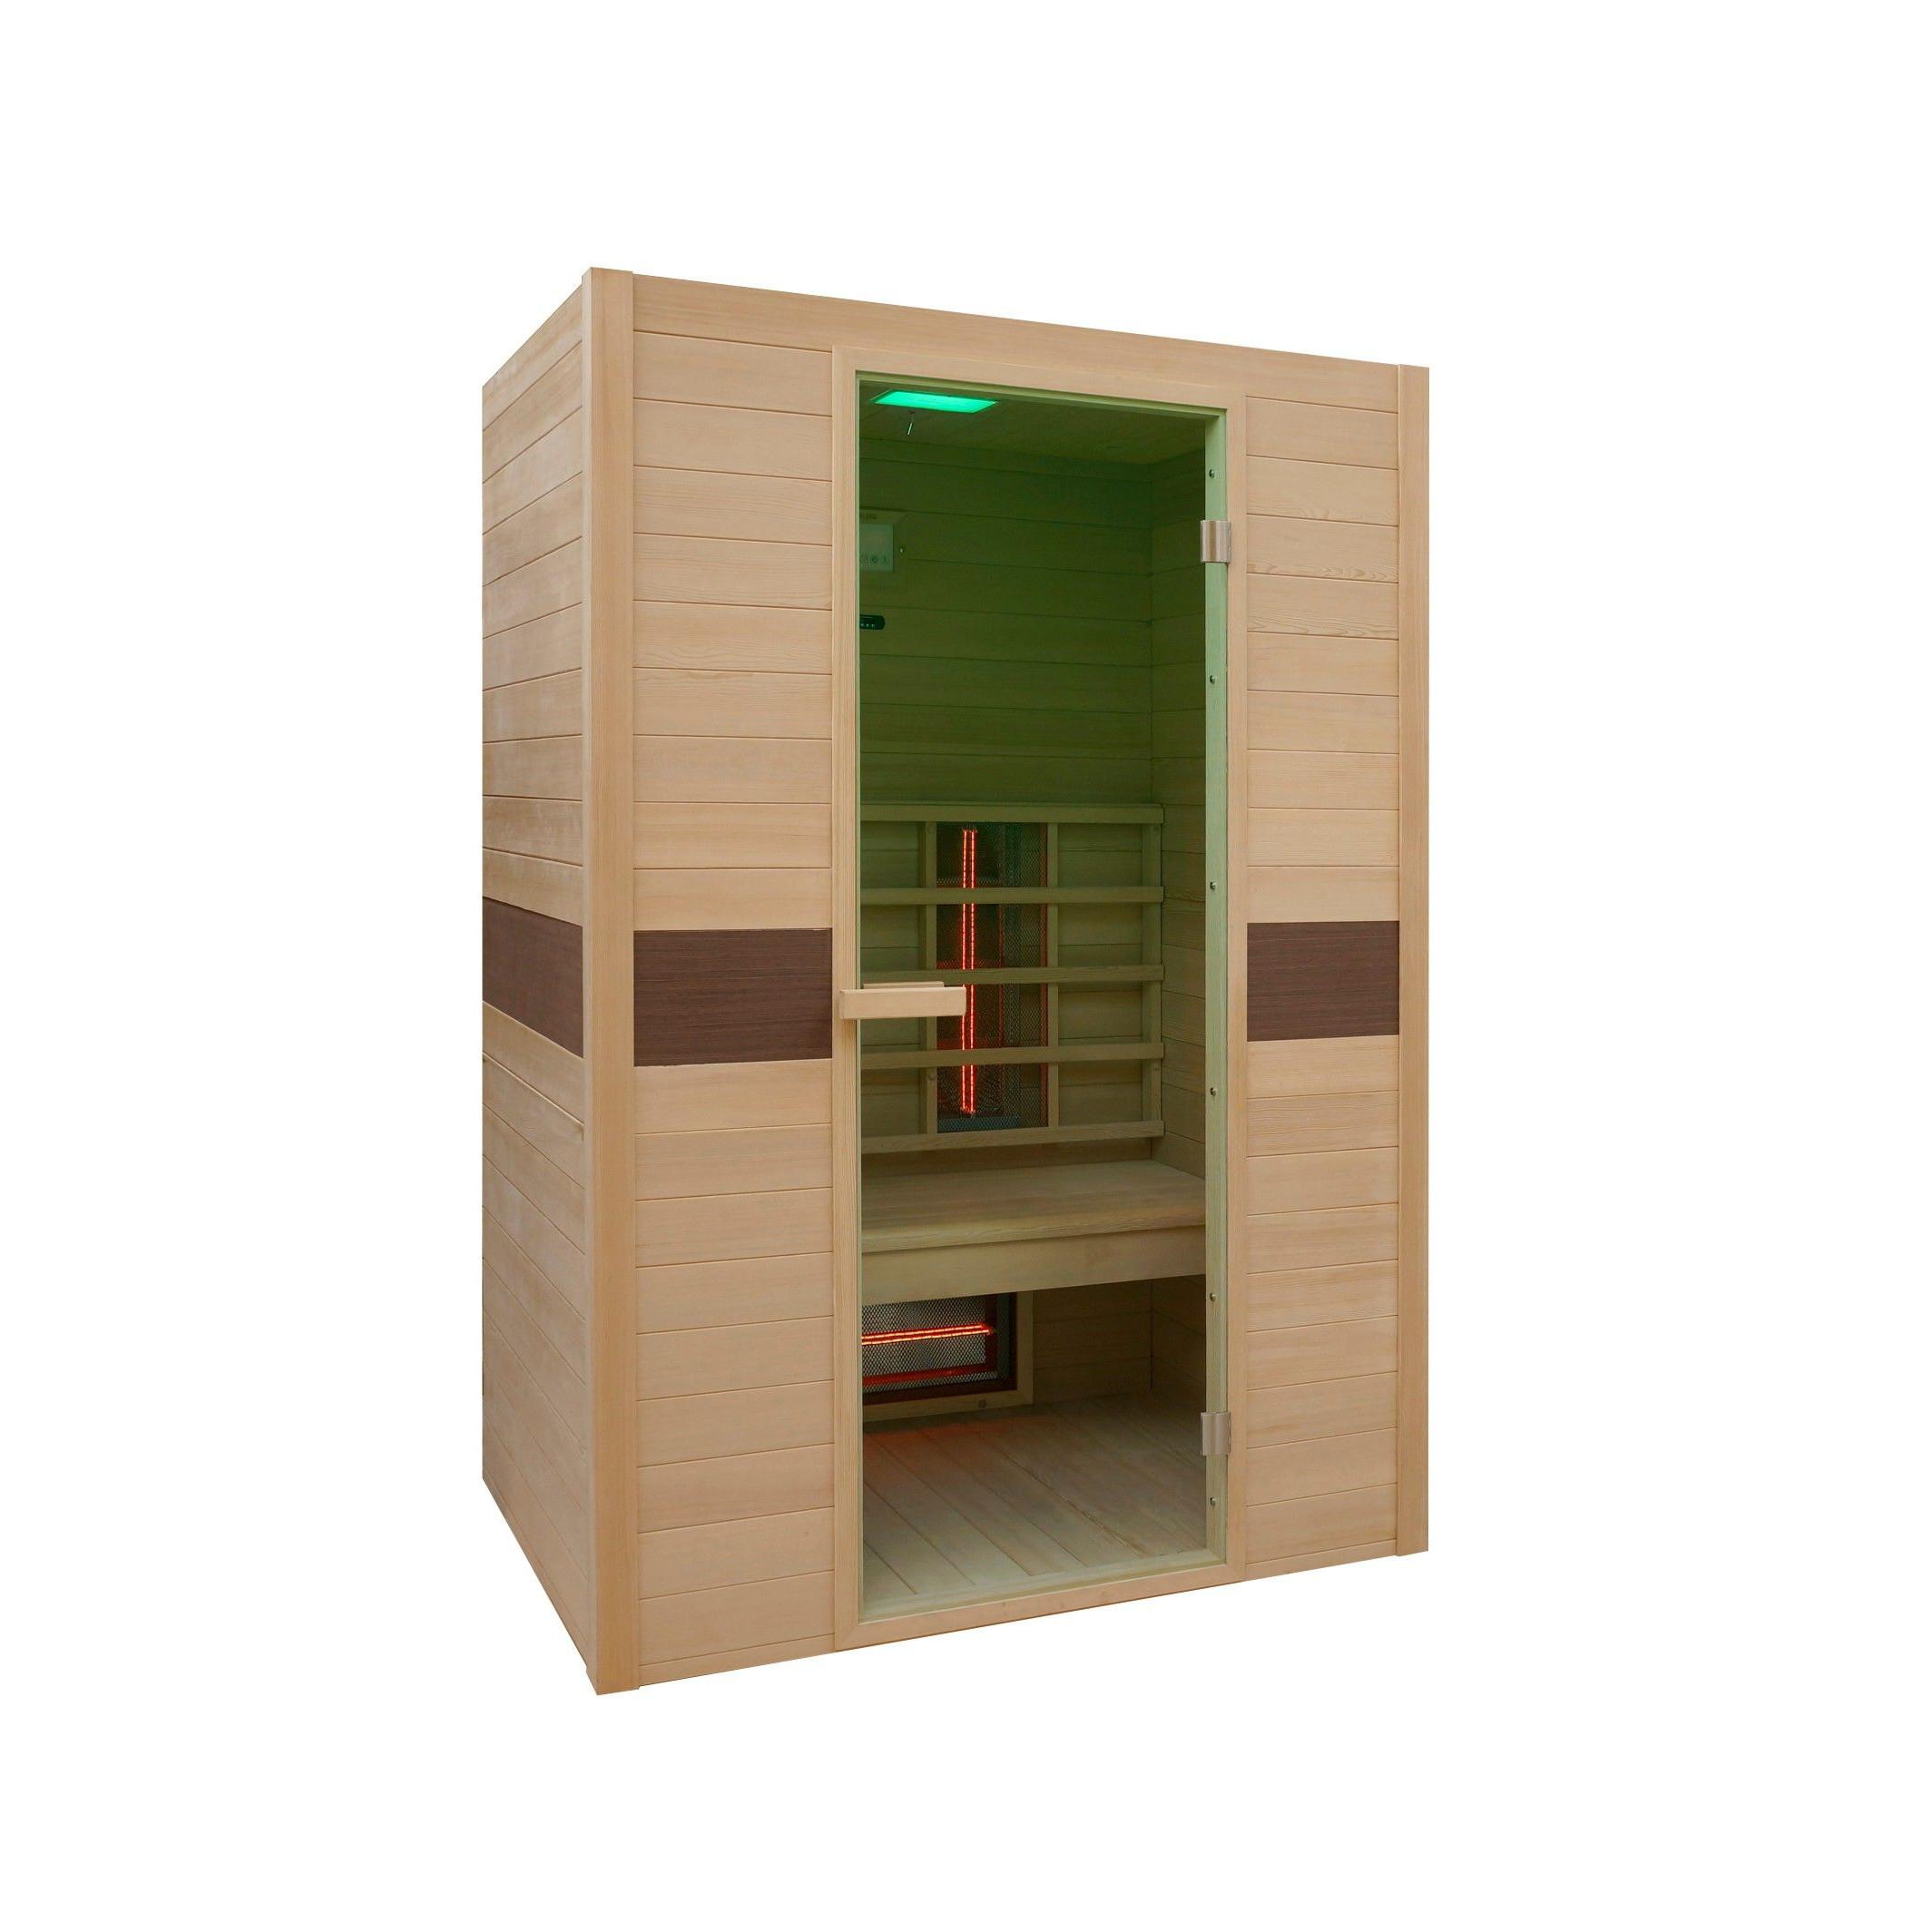 Infrarot-Sauna Rubin   2 Personen